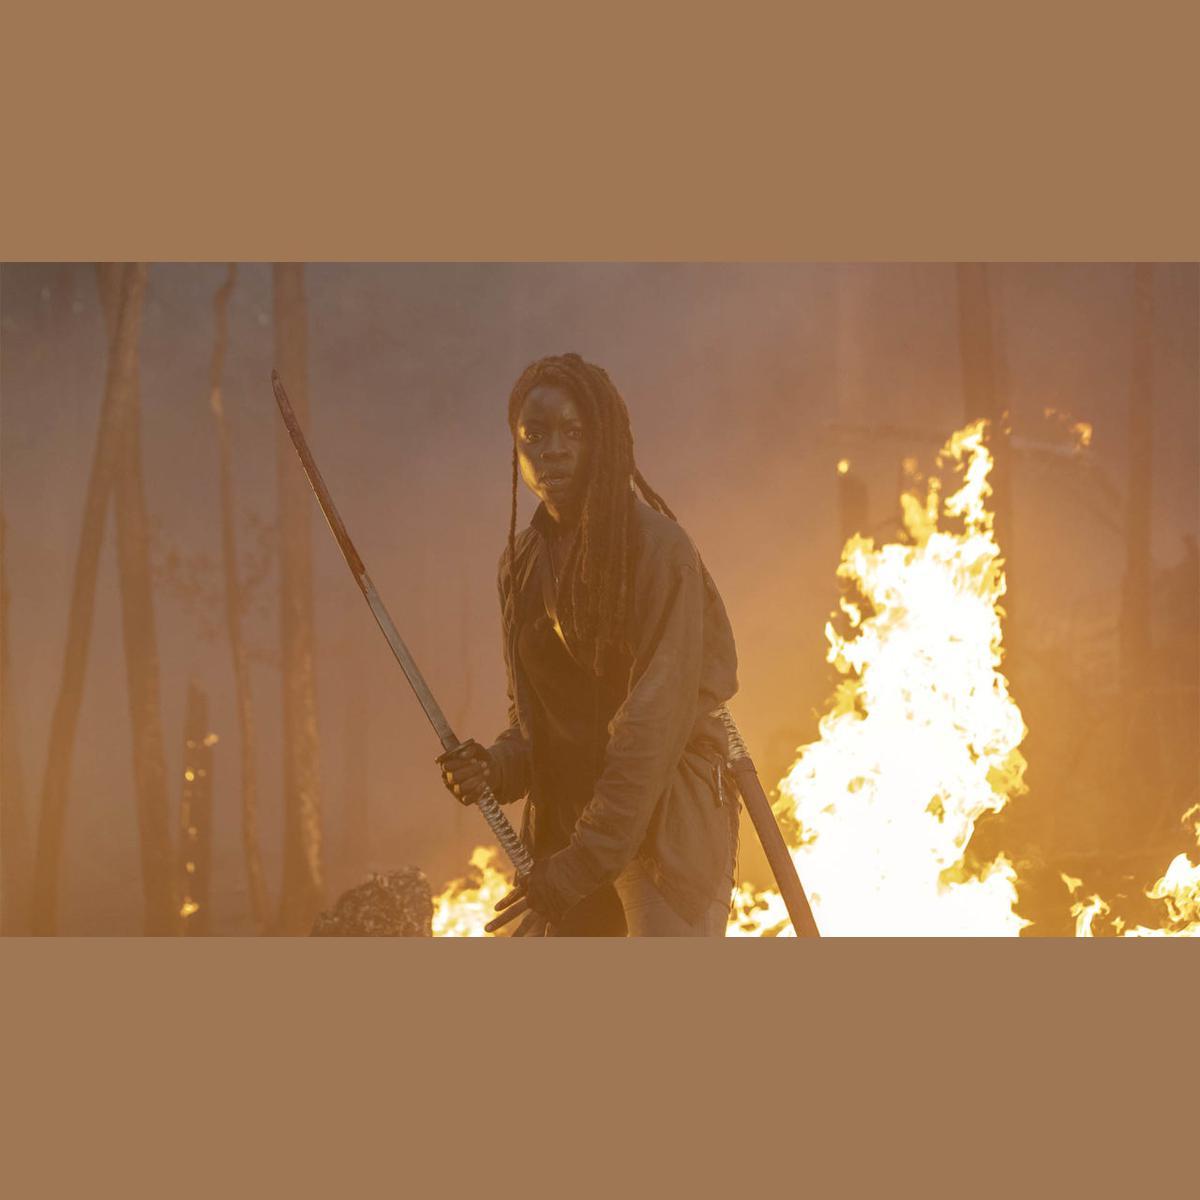 The Walking Dead - Staffel 10 - Folge 1 & 2 (O-Ton) kostenlos im Stream (VPN)